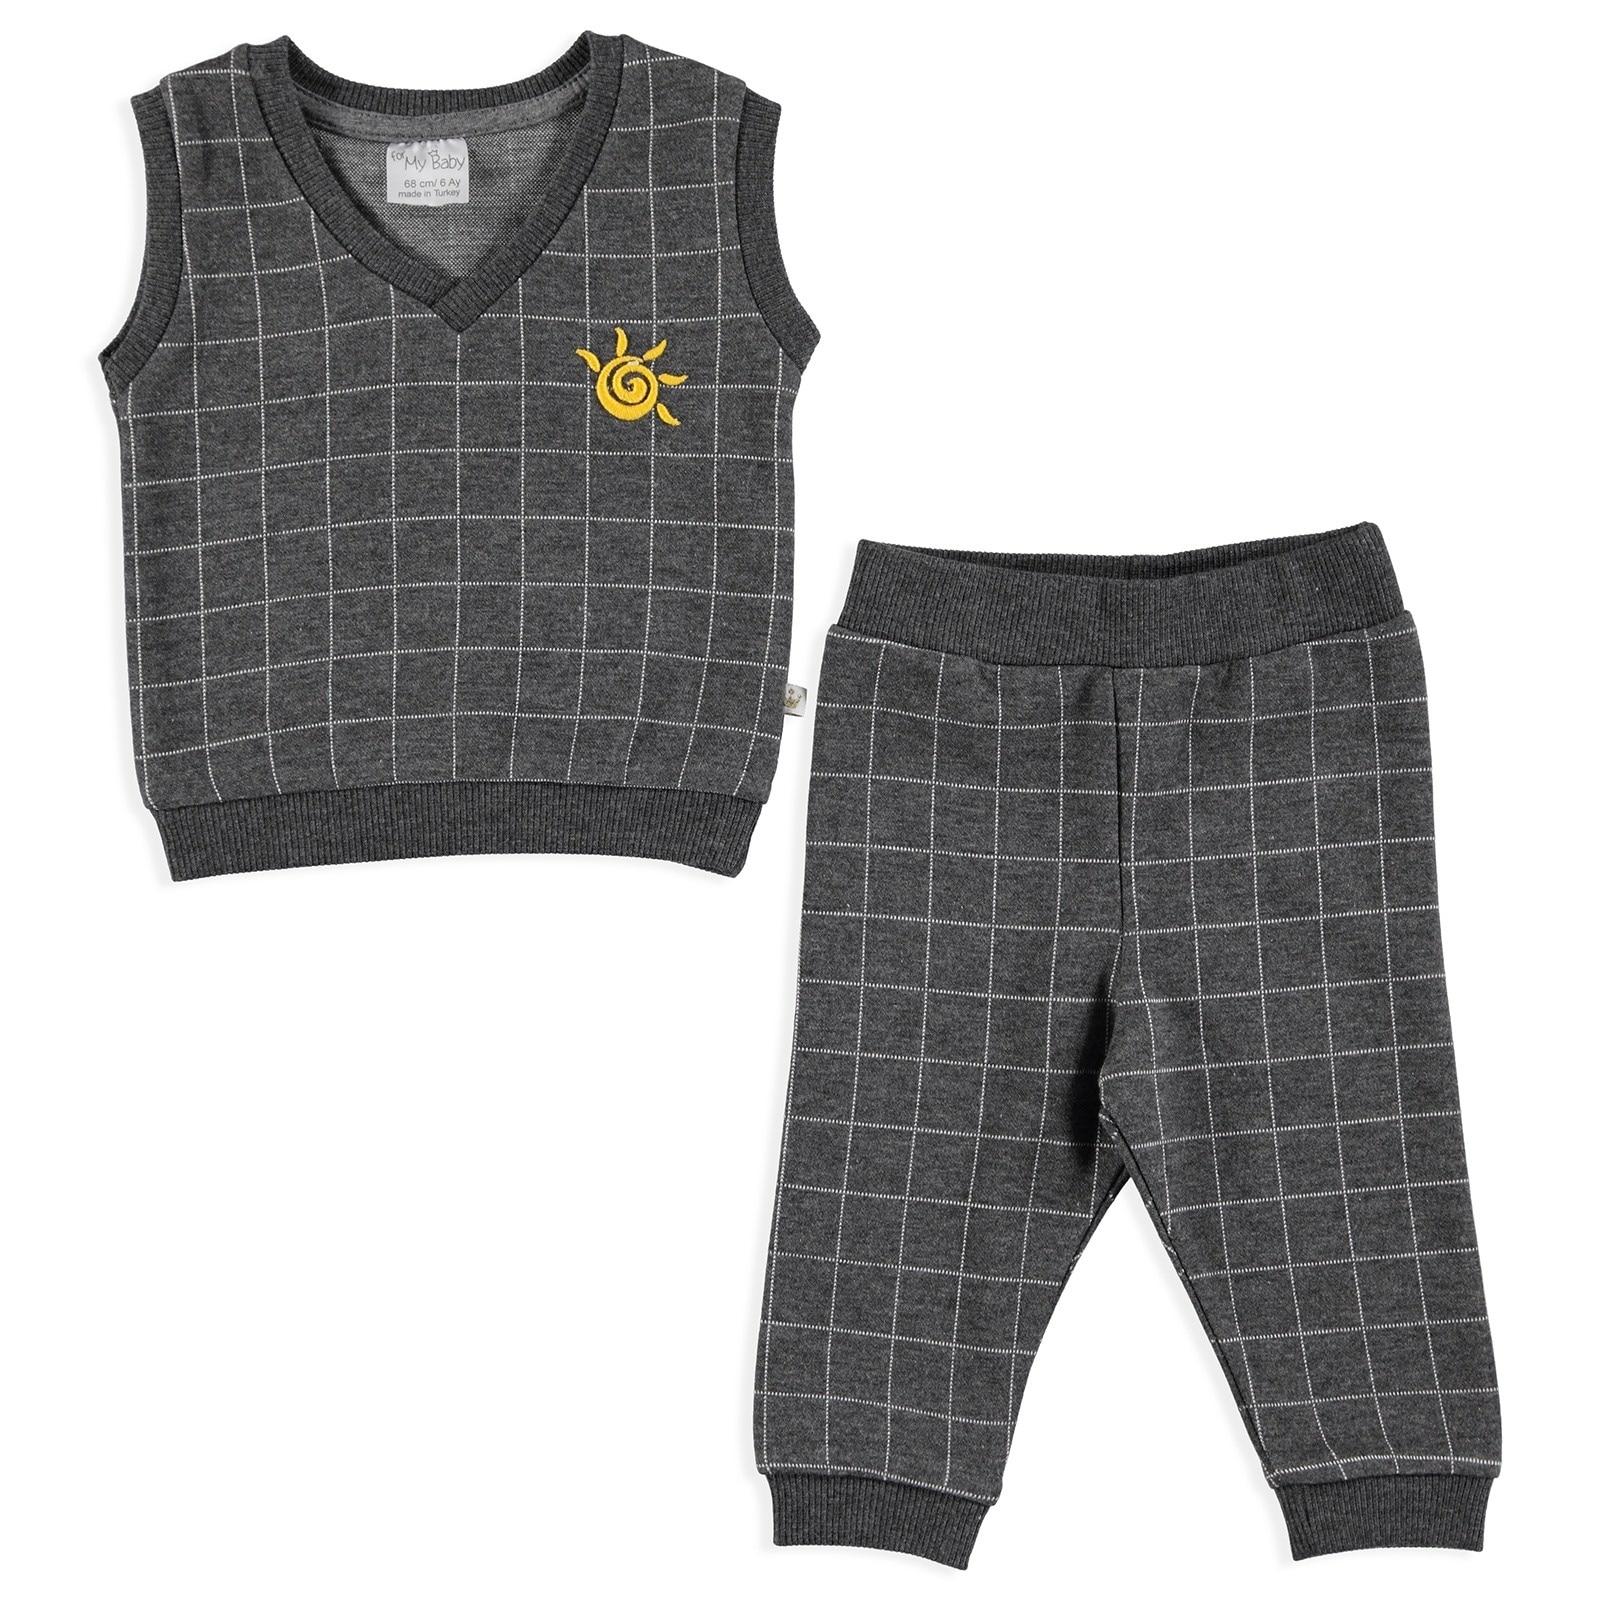 Ebebek For My Baby Winter Smile Sweater Pants 2 Pcs Set